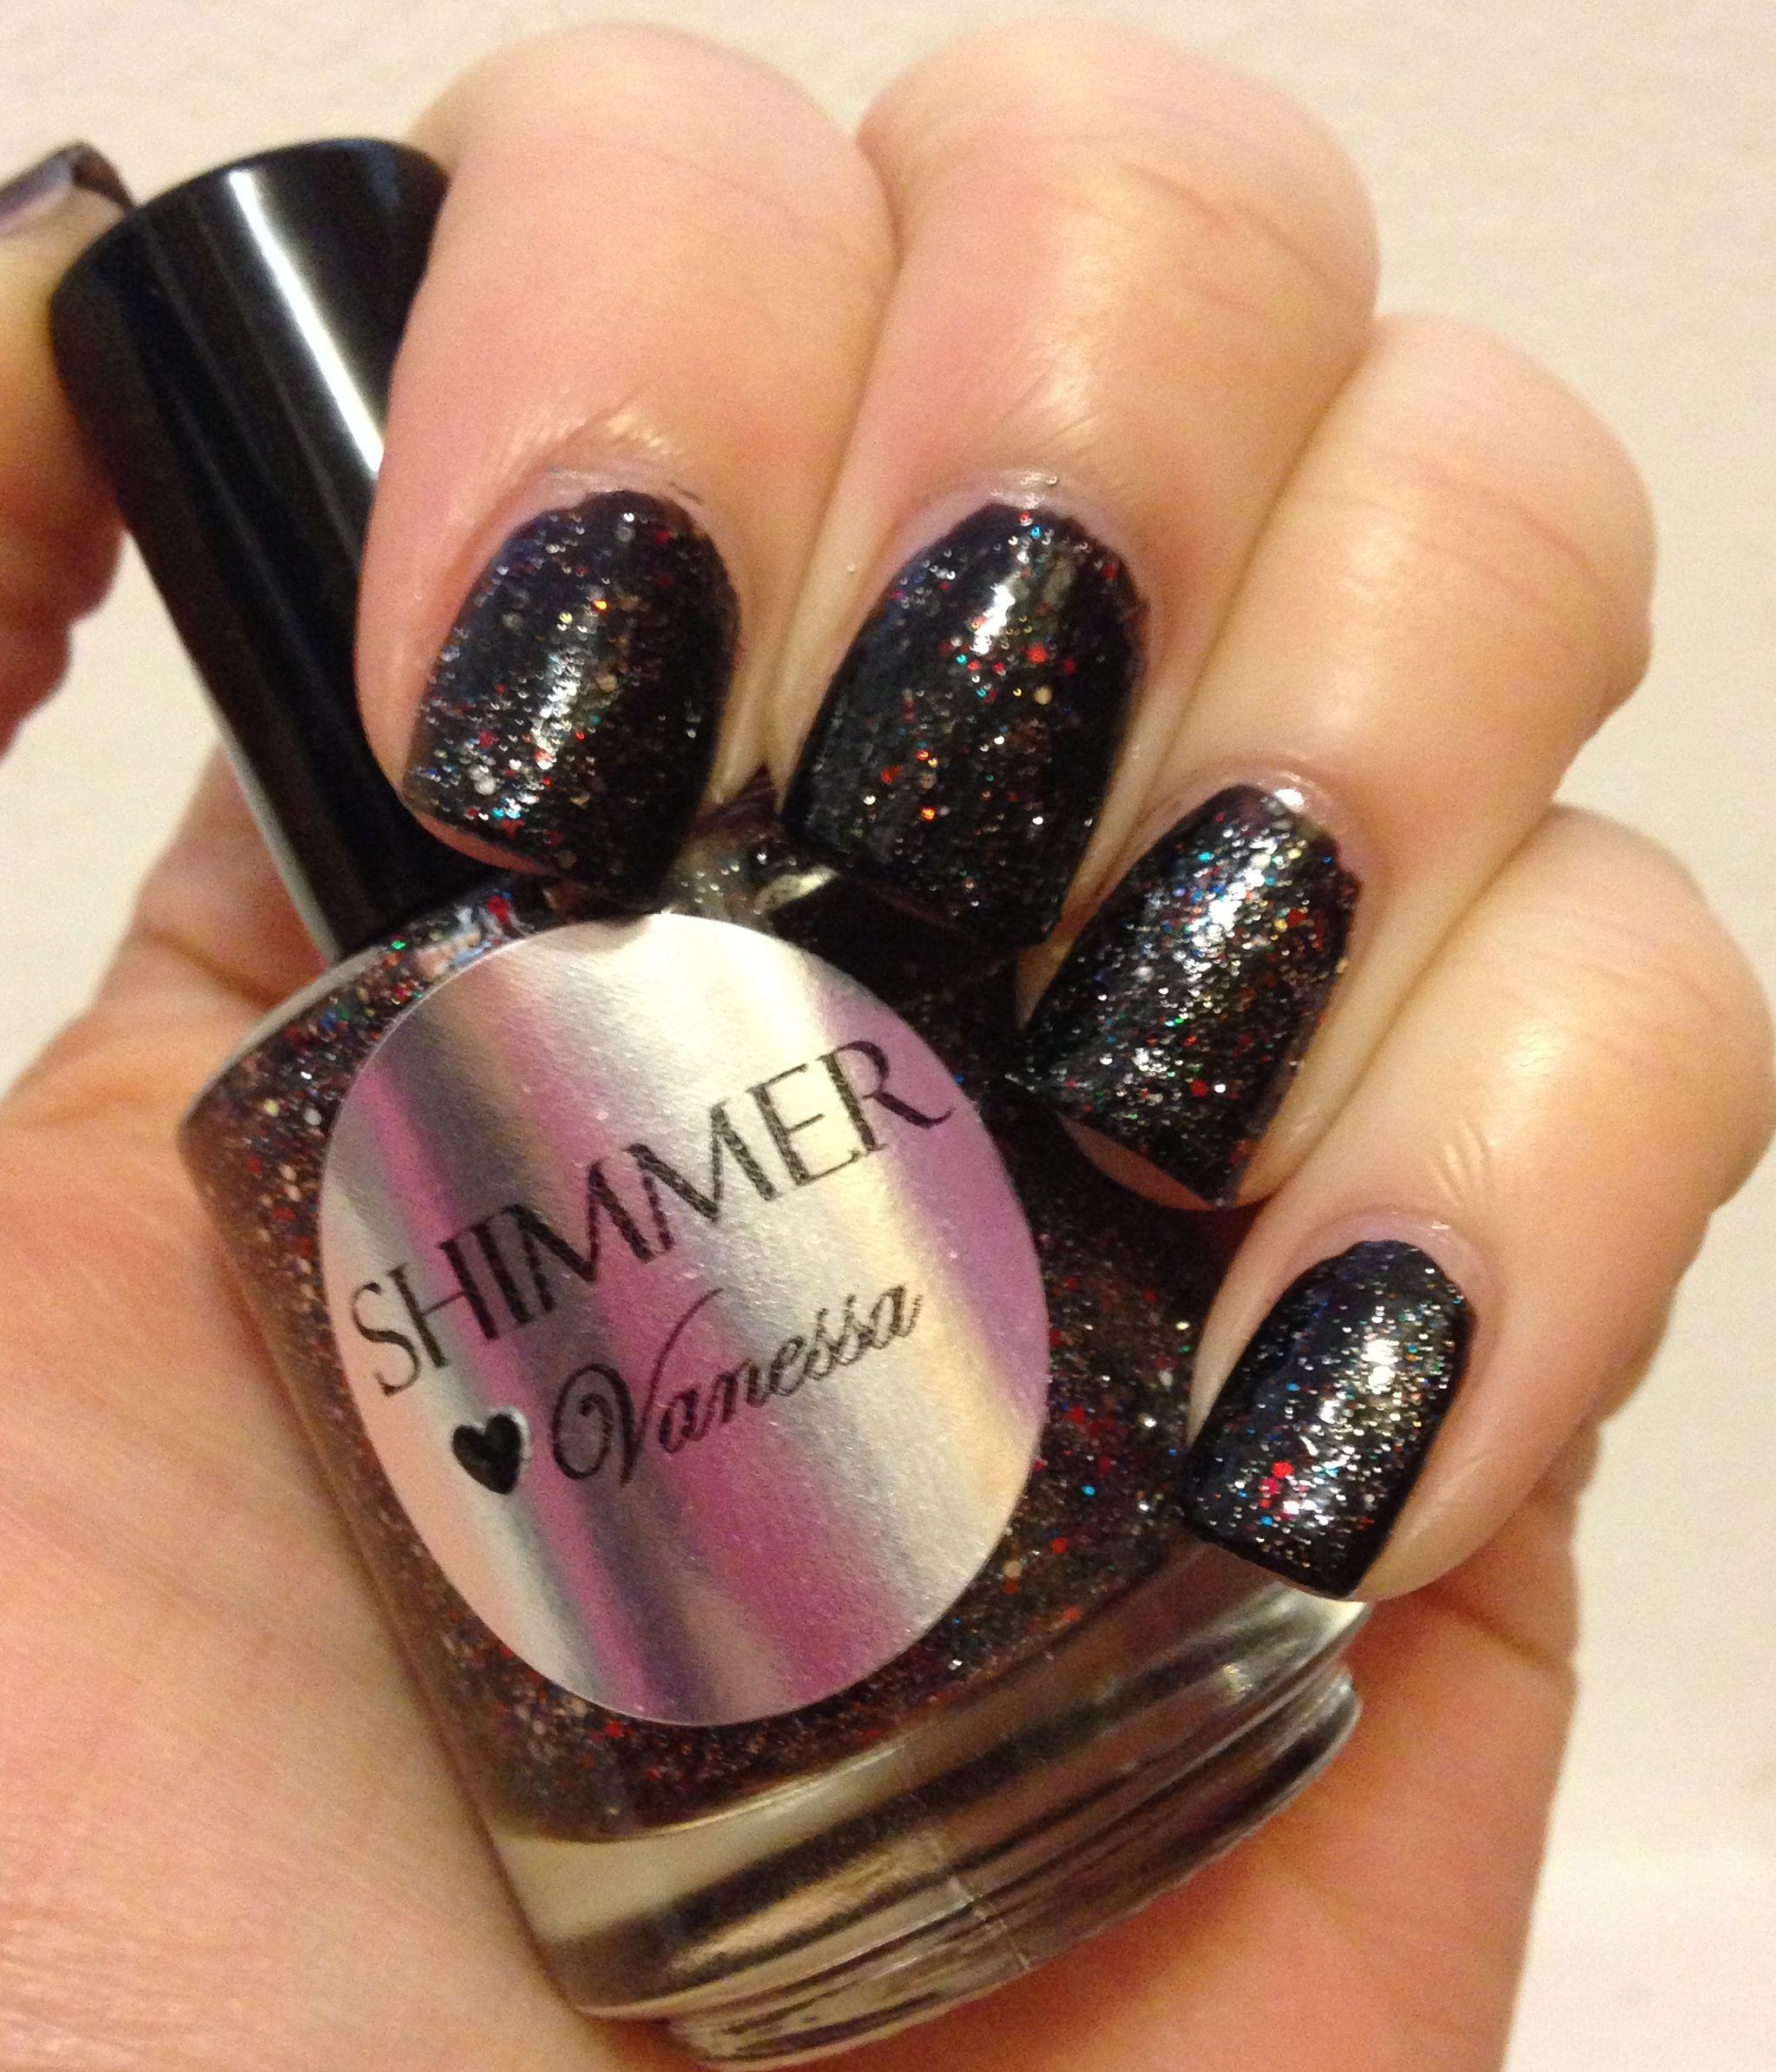 Indie Spotlight Shimmer Polish Part IV Nail polish